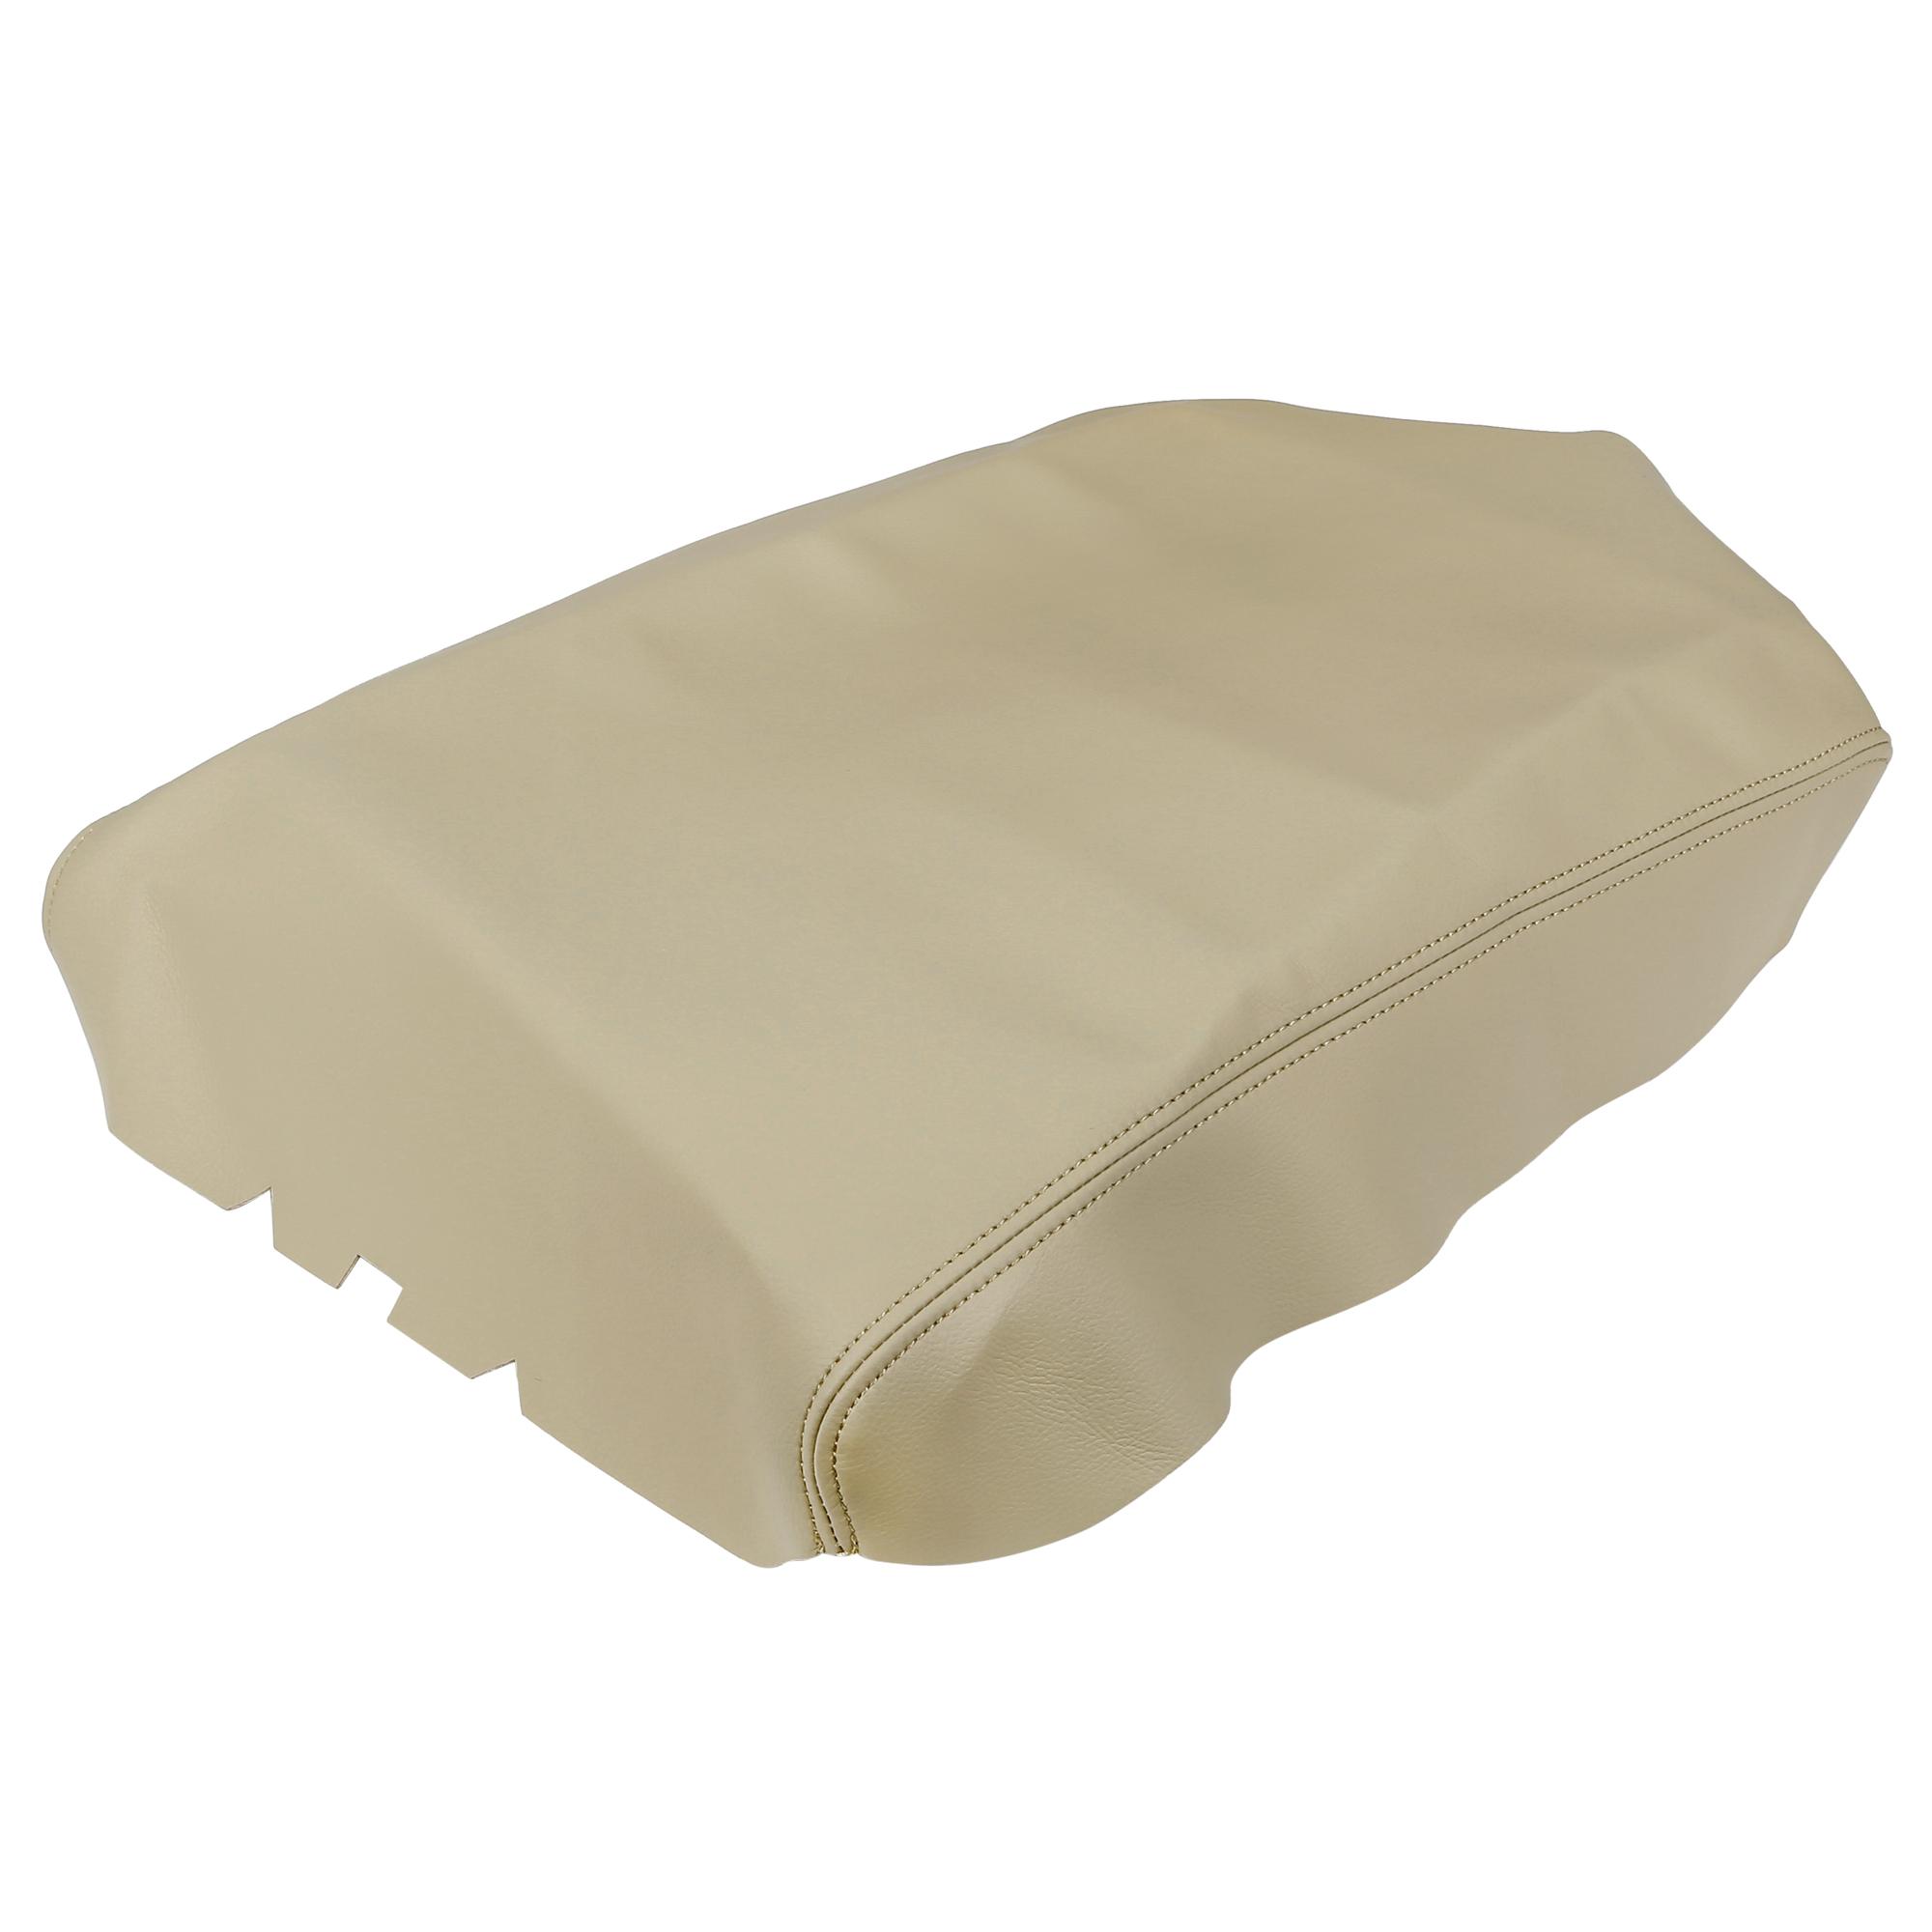 Car Center Console Lid Armrest Pad Cover Beige for Nissan Titan 2004-2014